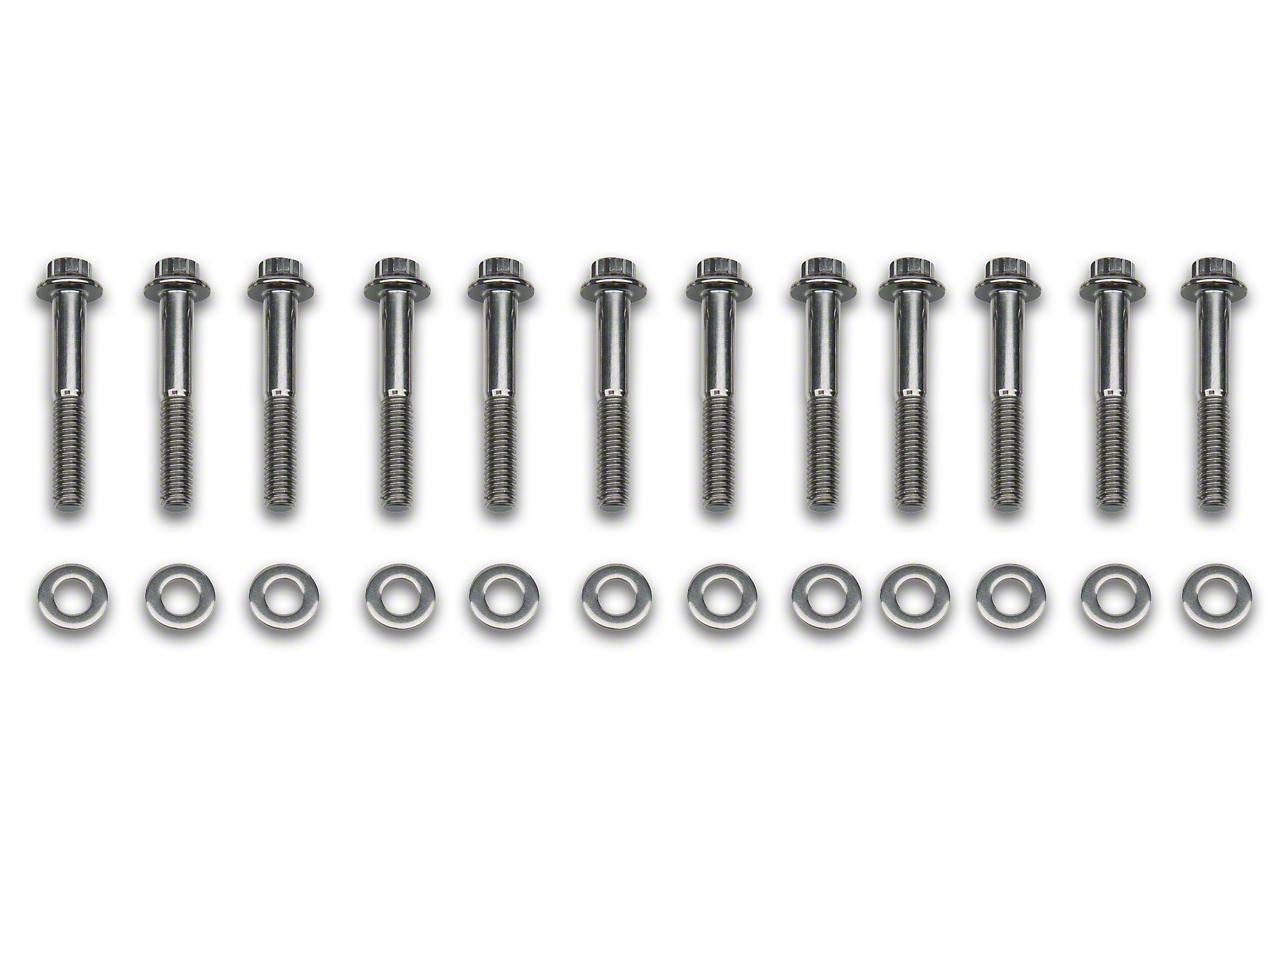 ARP Intake Manifold Bolt Kit (79-95 5.0L, 5.8L)